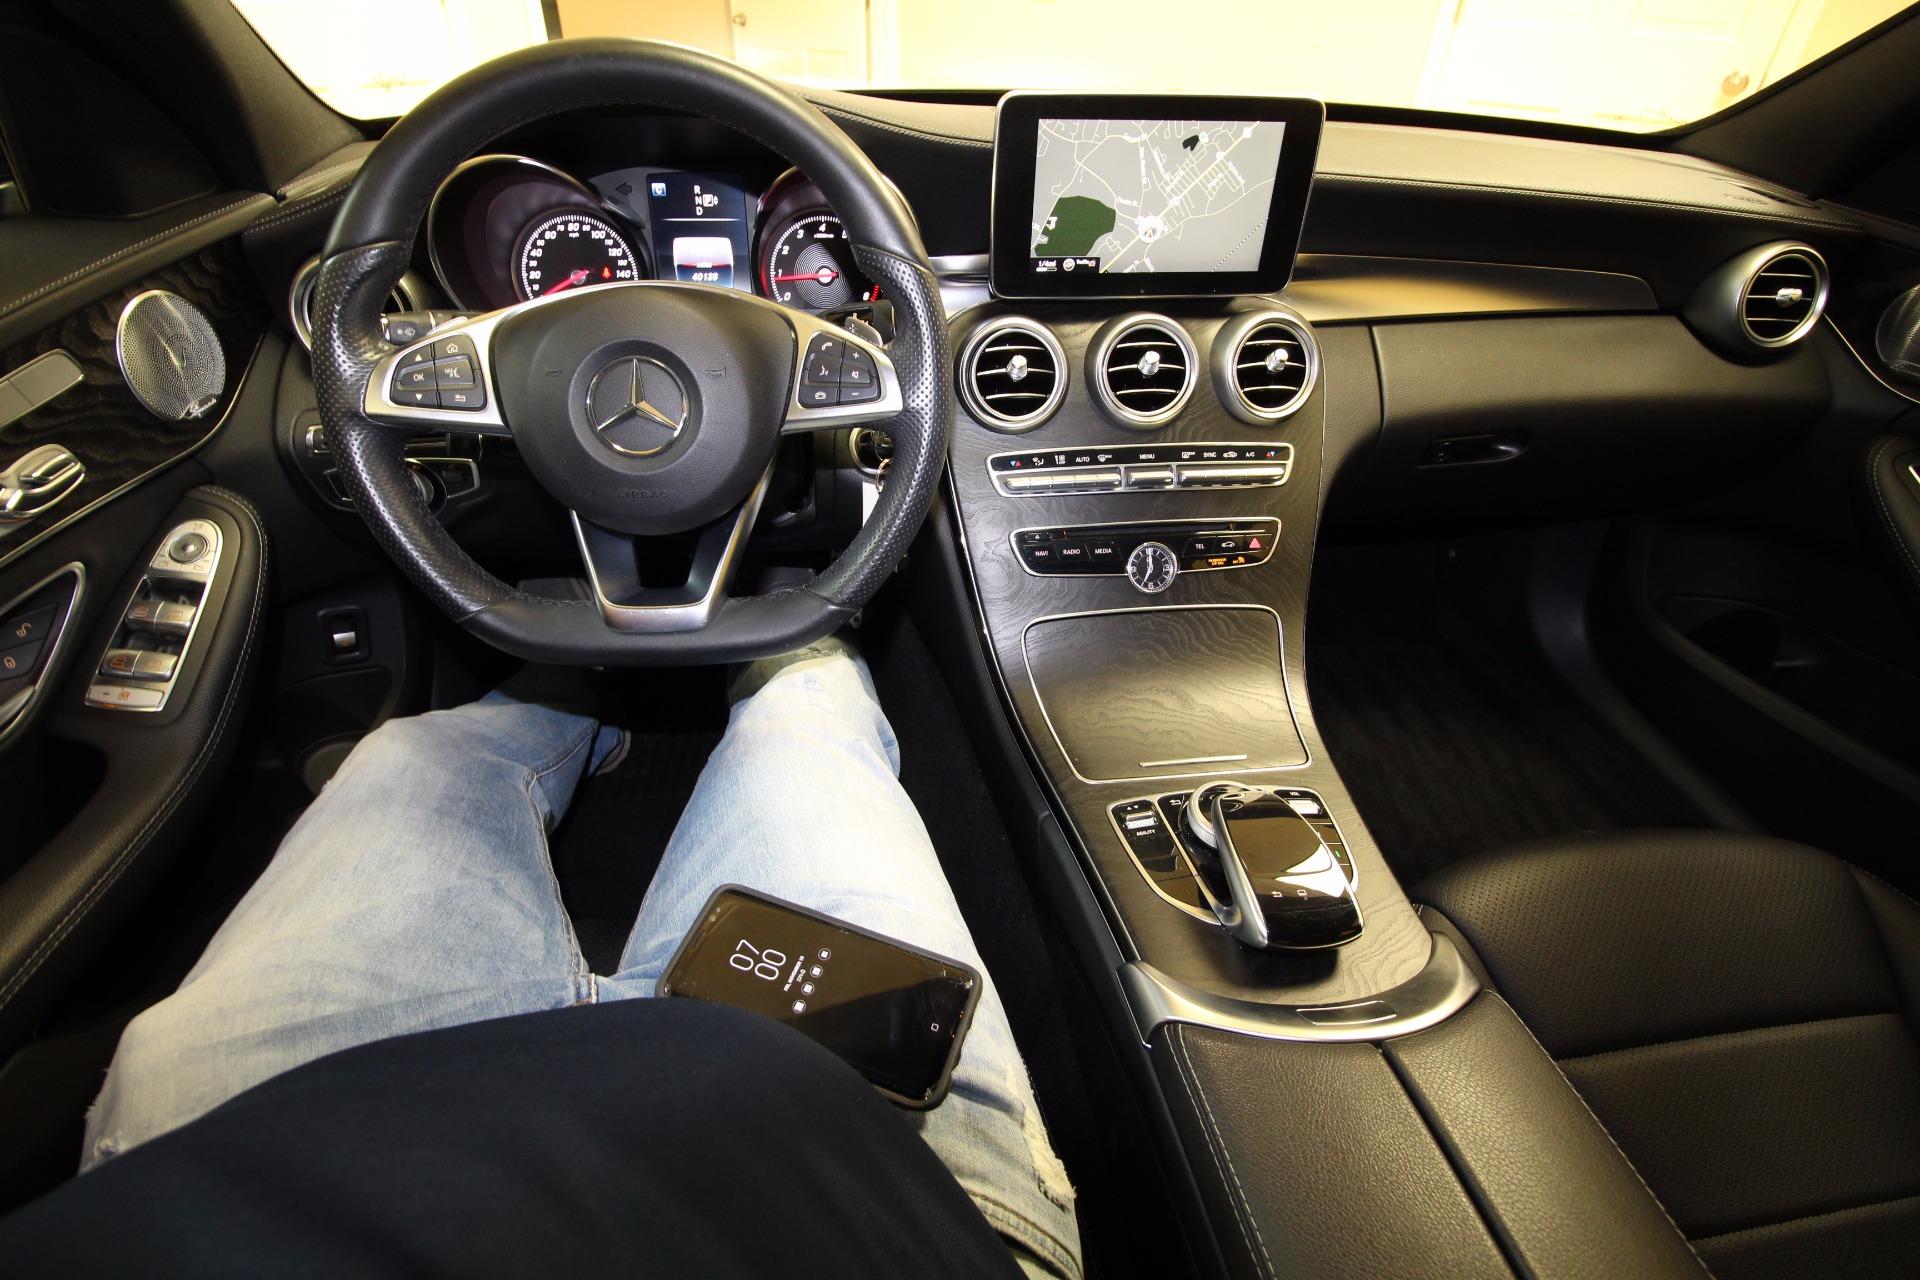 2015 Mercedes-Benz C-Class C300 4MATIC Sedan Stock # 17223